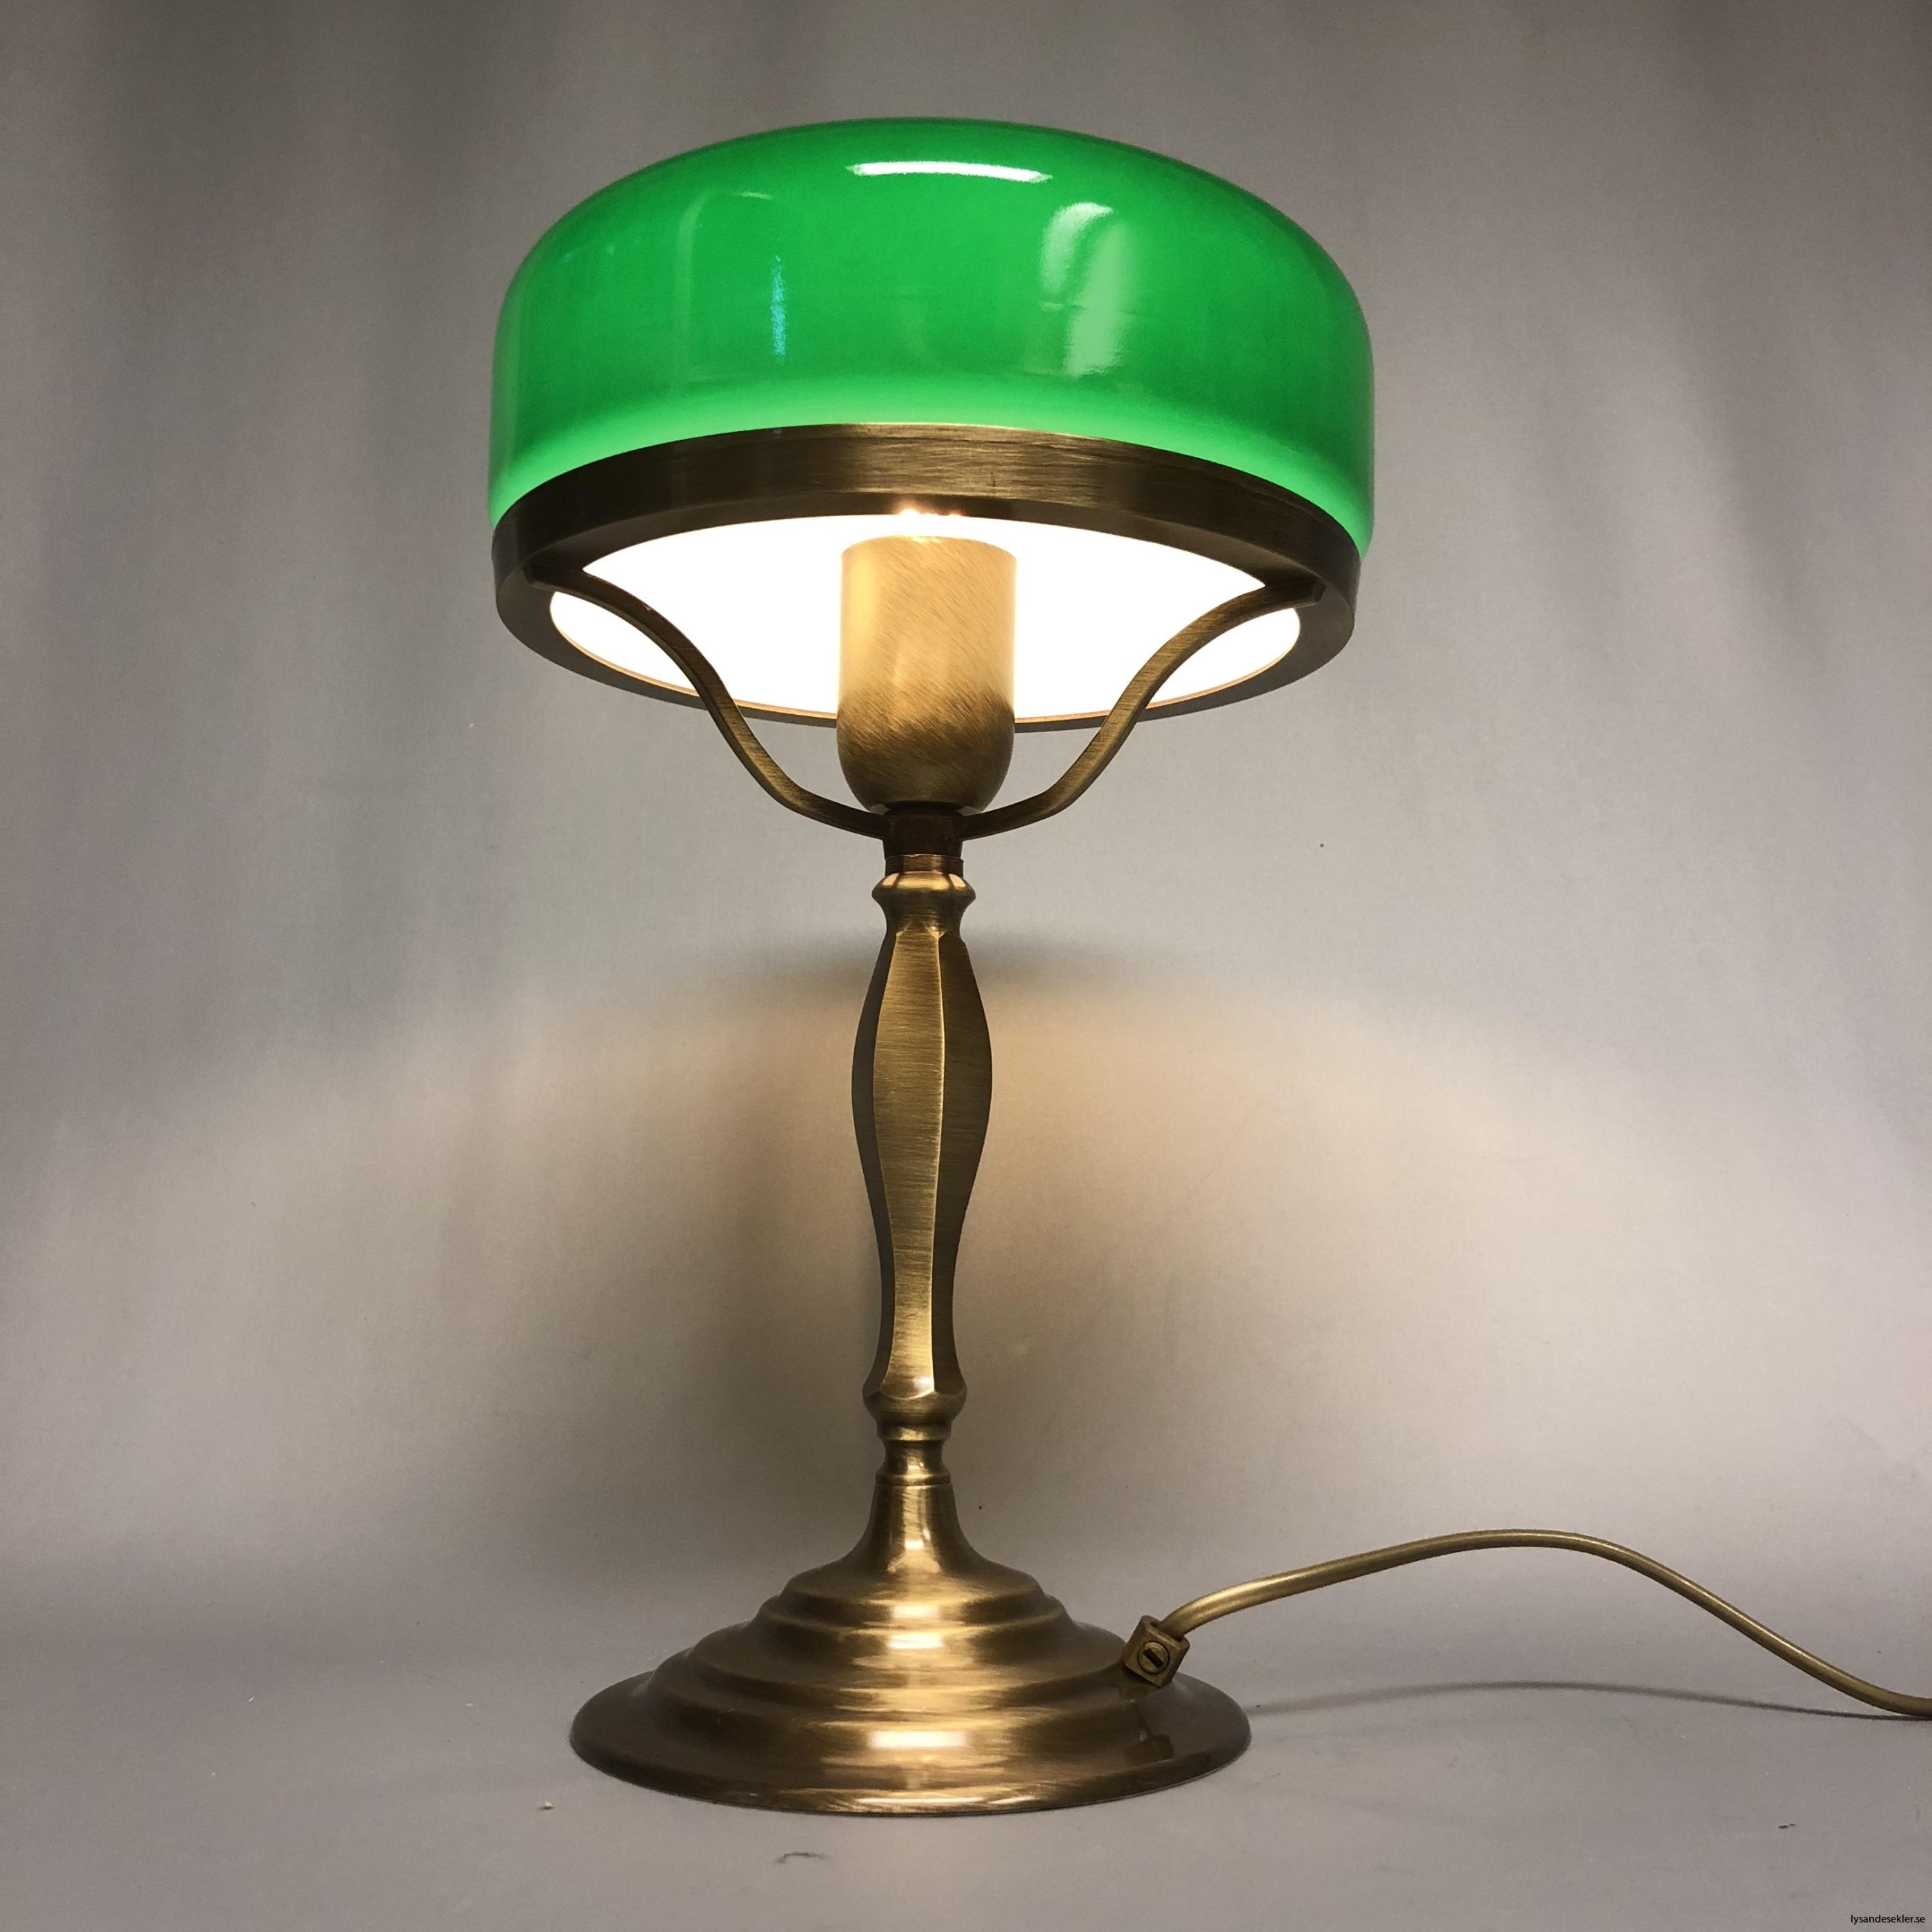 strindbergslampa strindbergslampor strindberg lampa skärm kupa strindbergsskärm strindbergskupa34